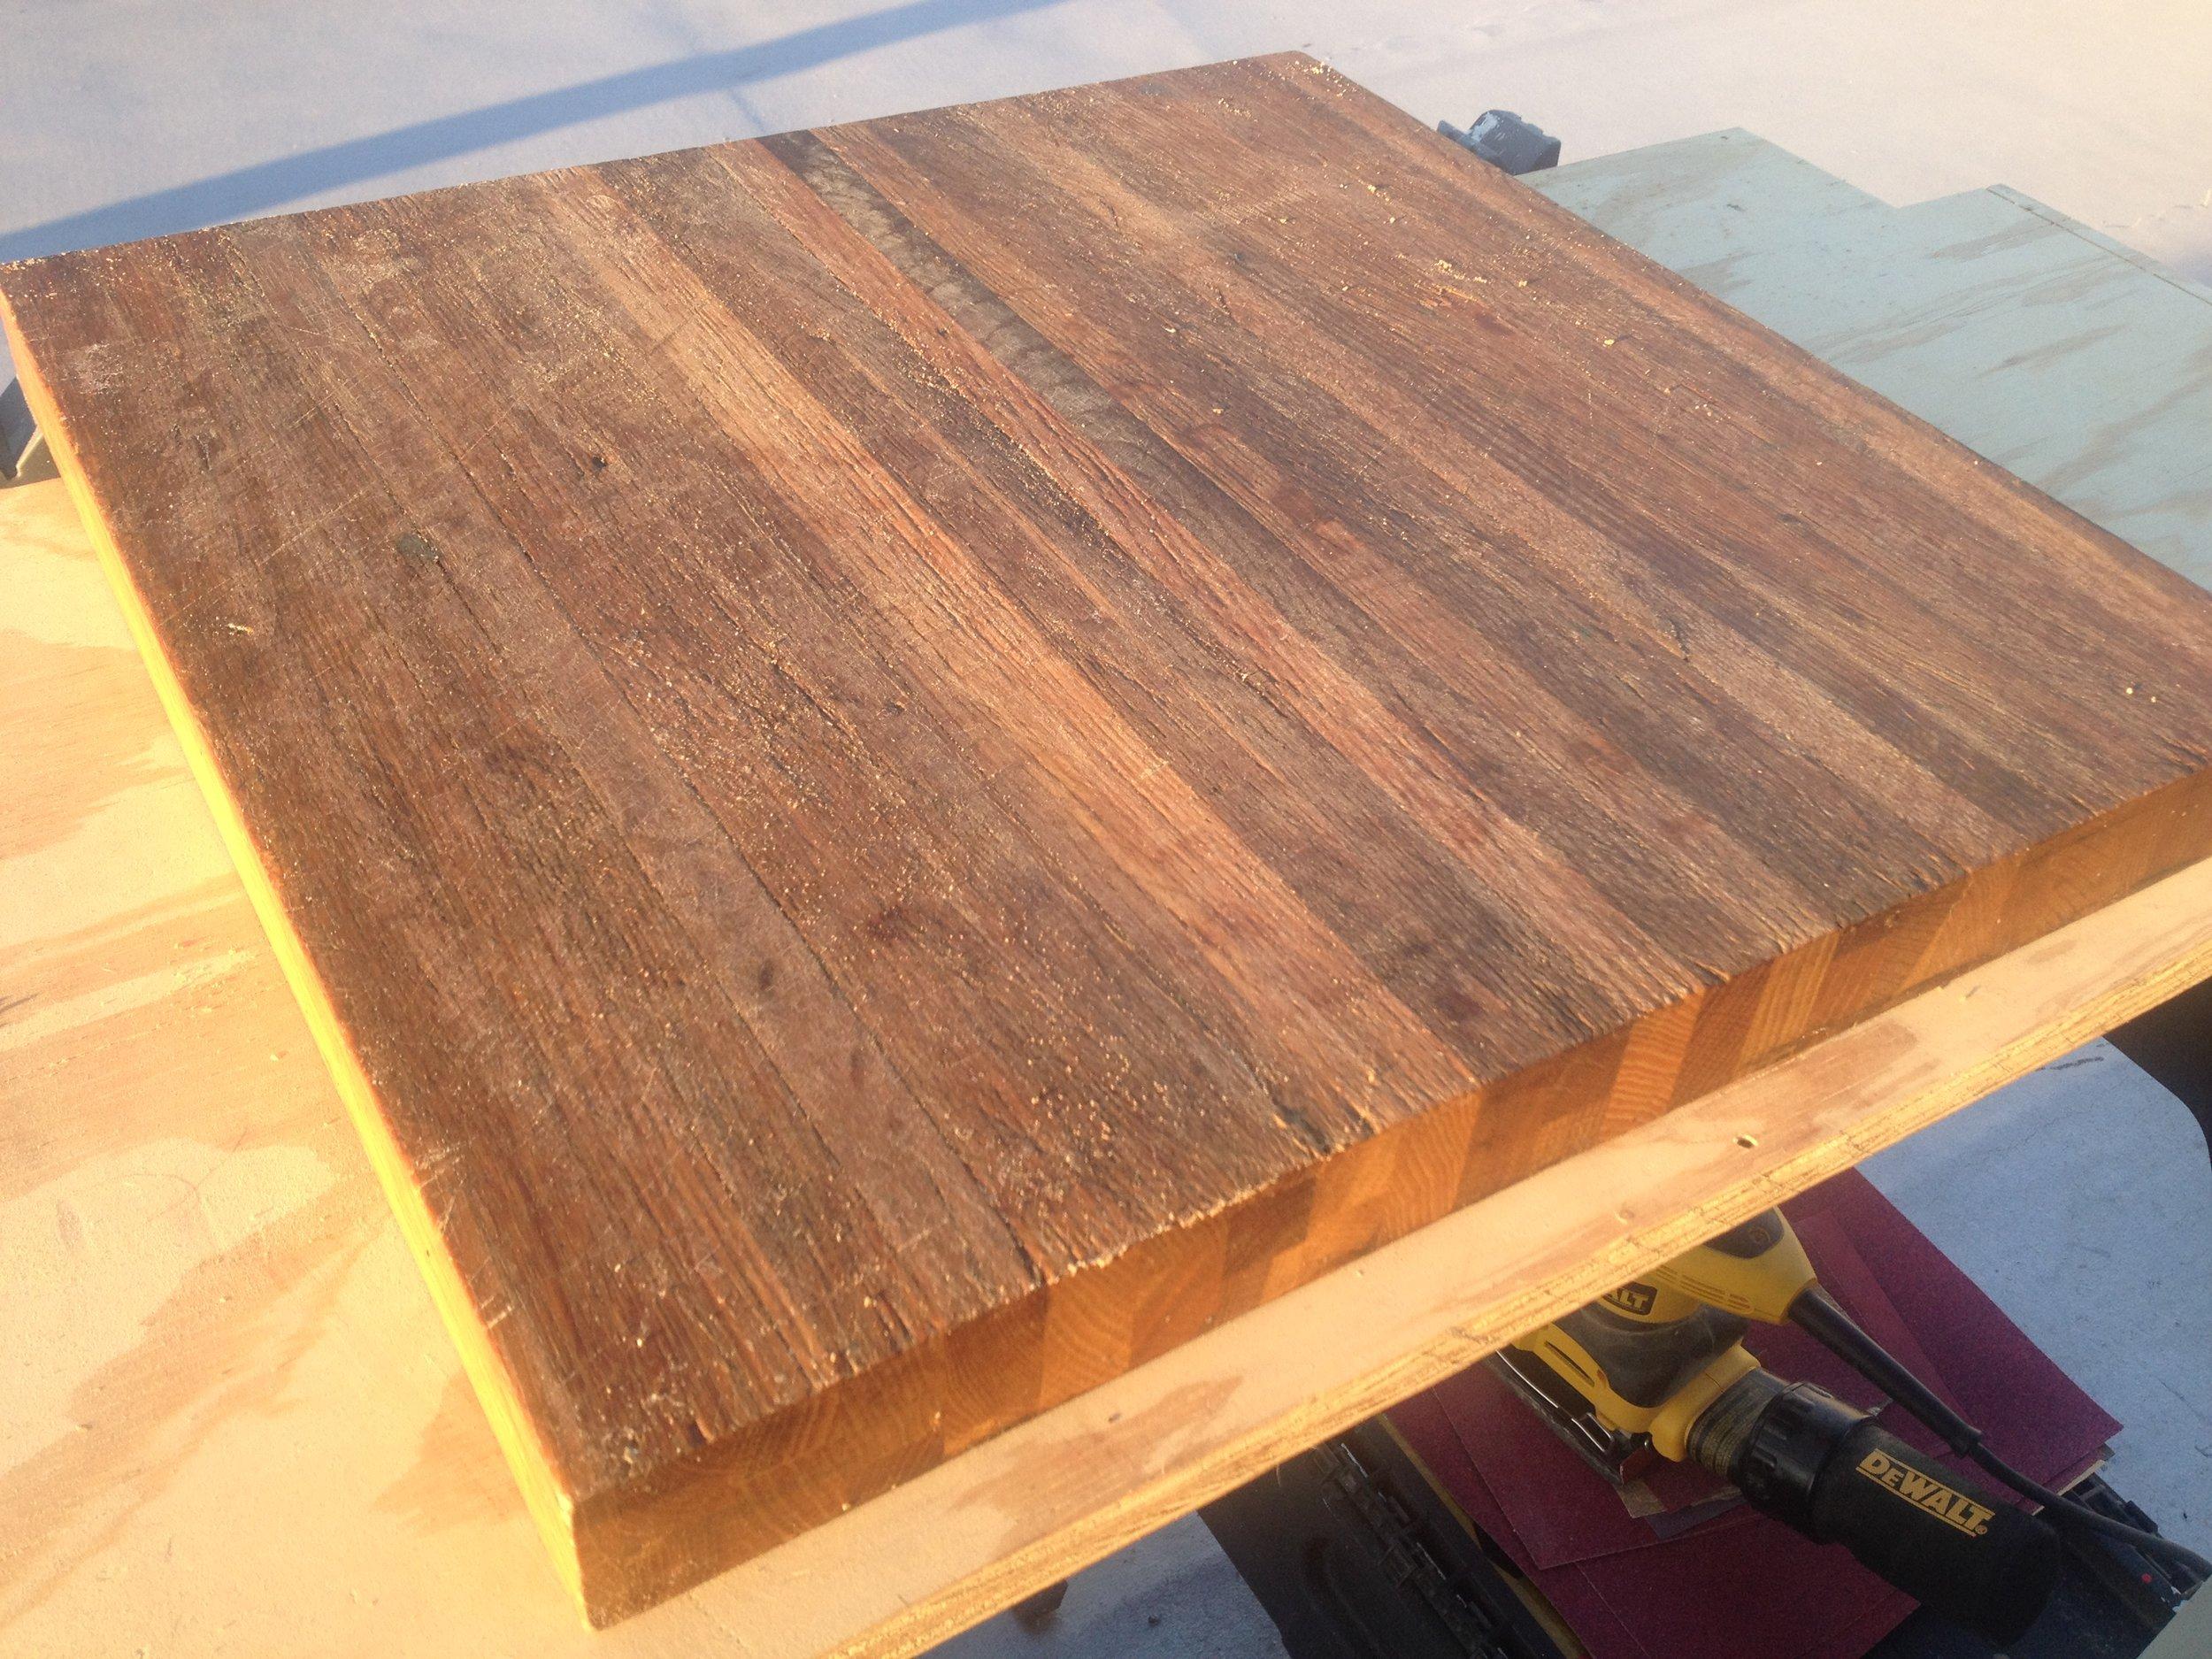 cutting-board-restoration-before-3.jpg